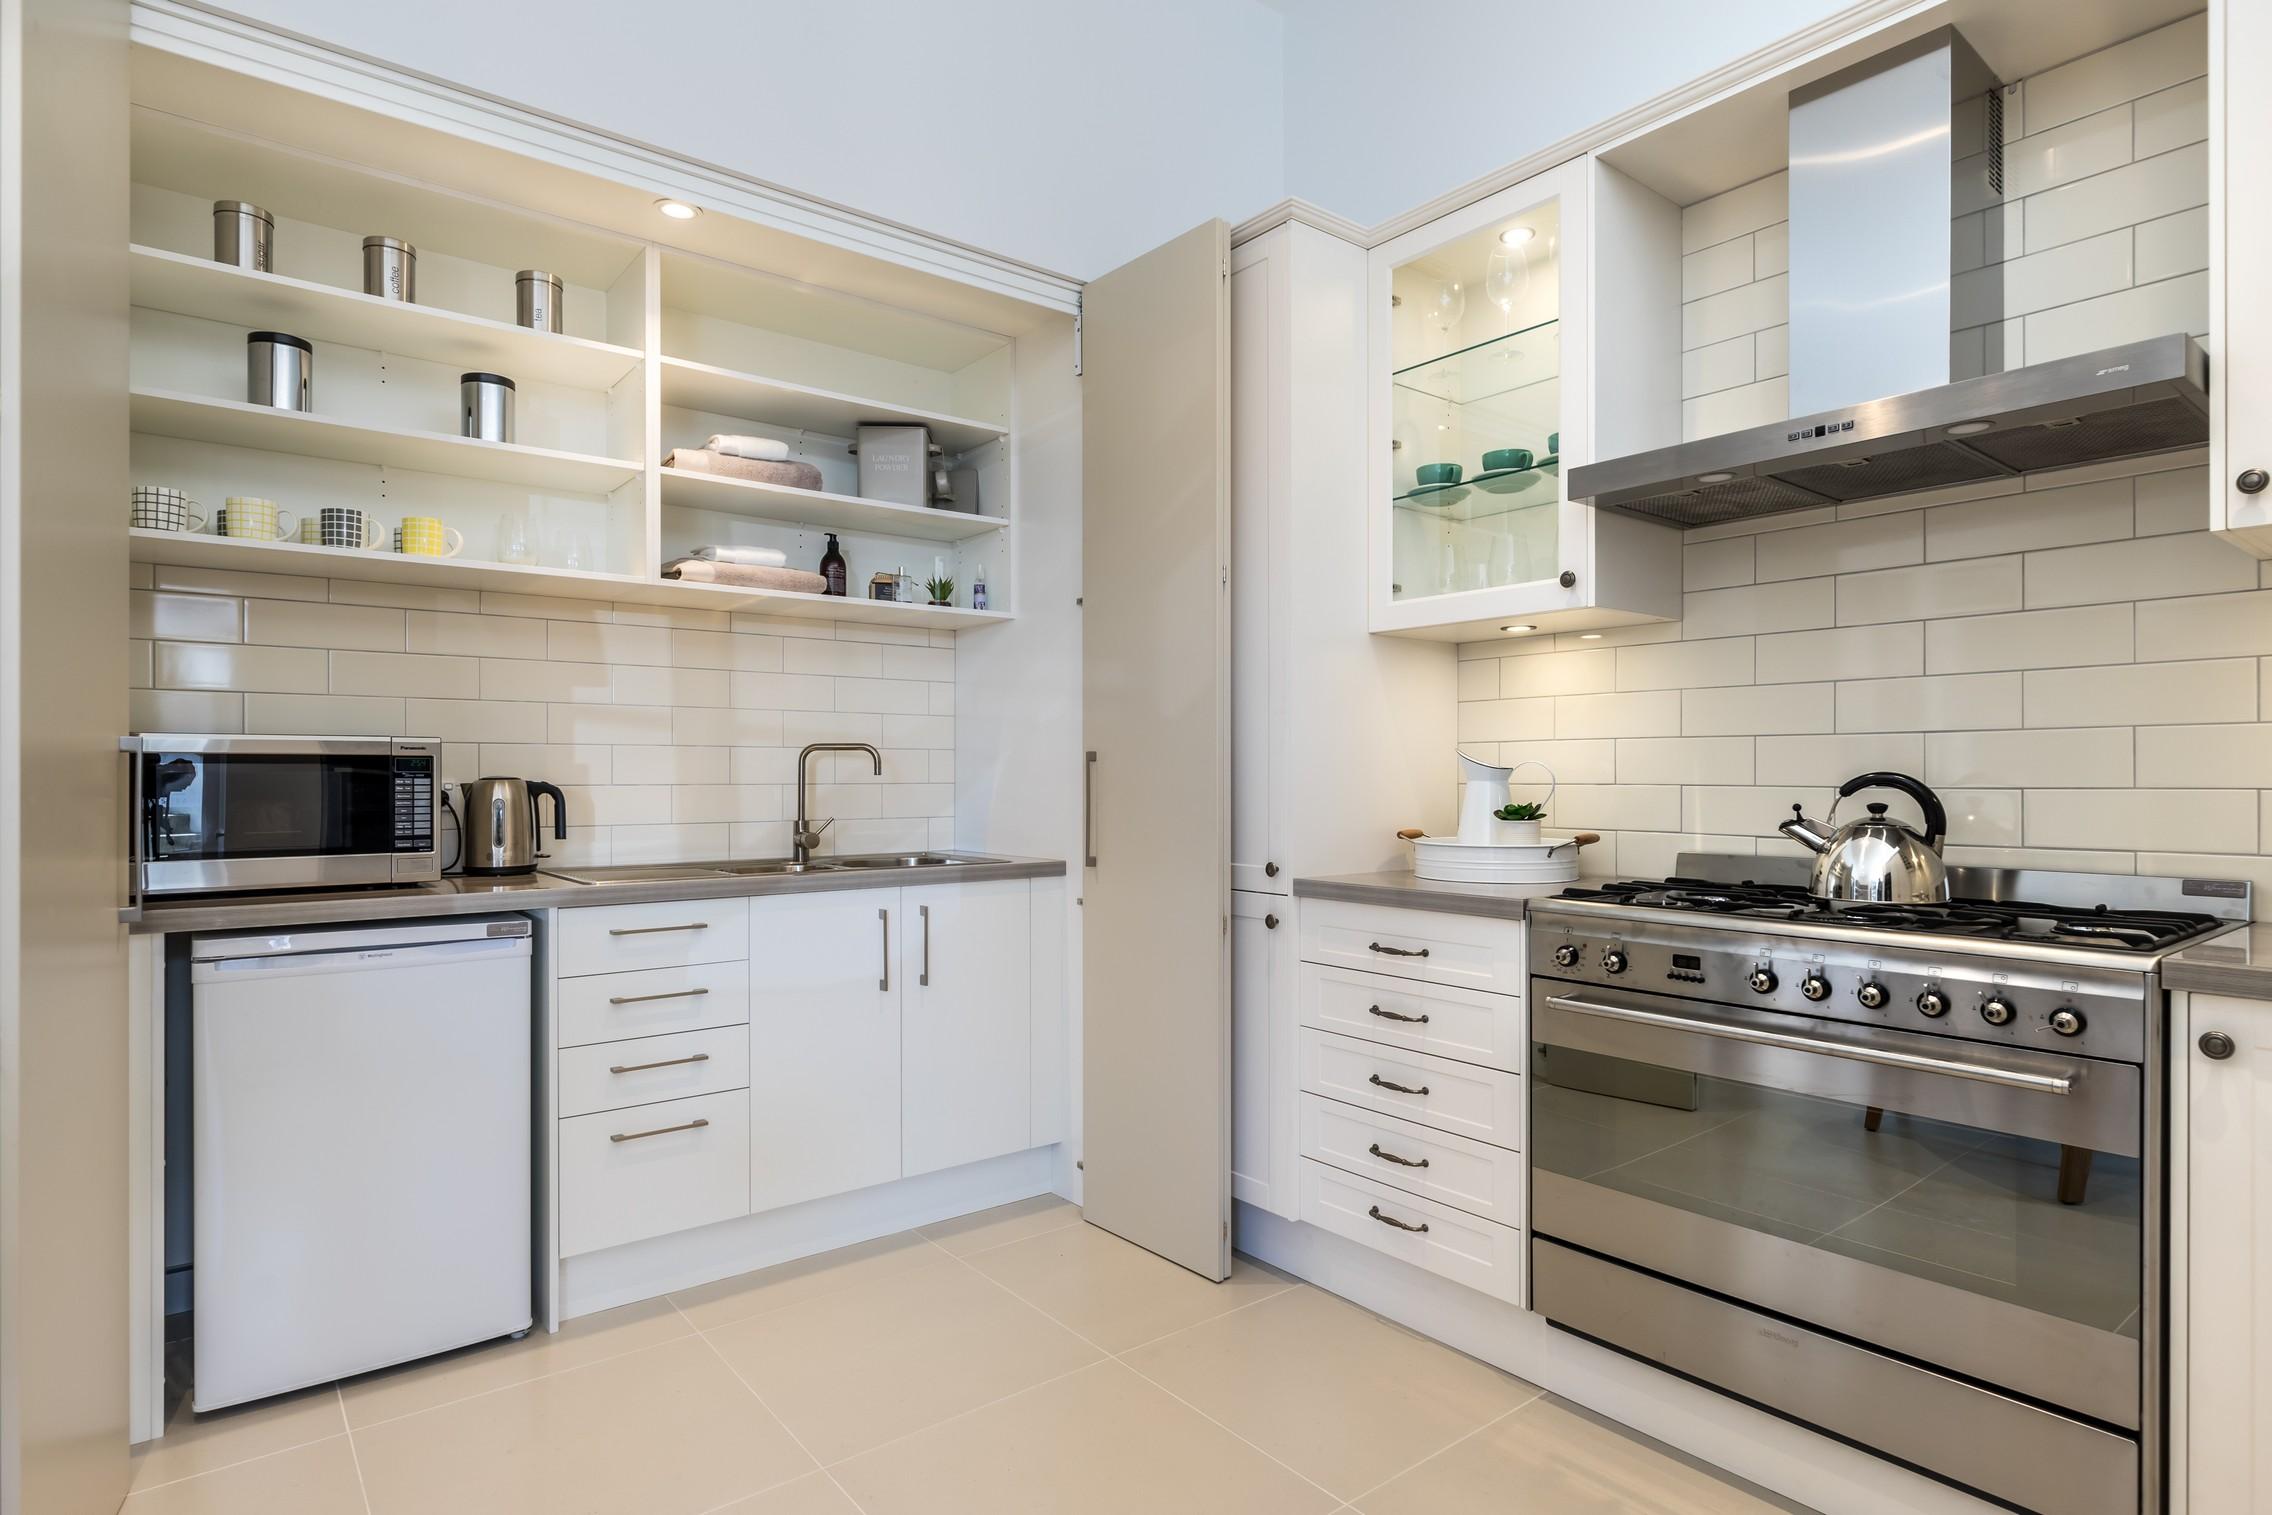 Gsp Designer Kitchens And Bathrooms